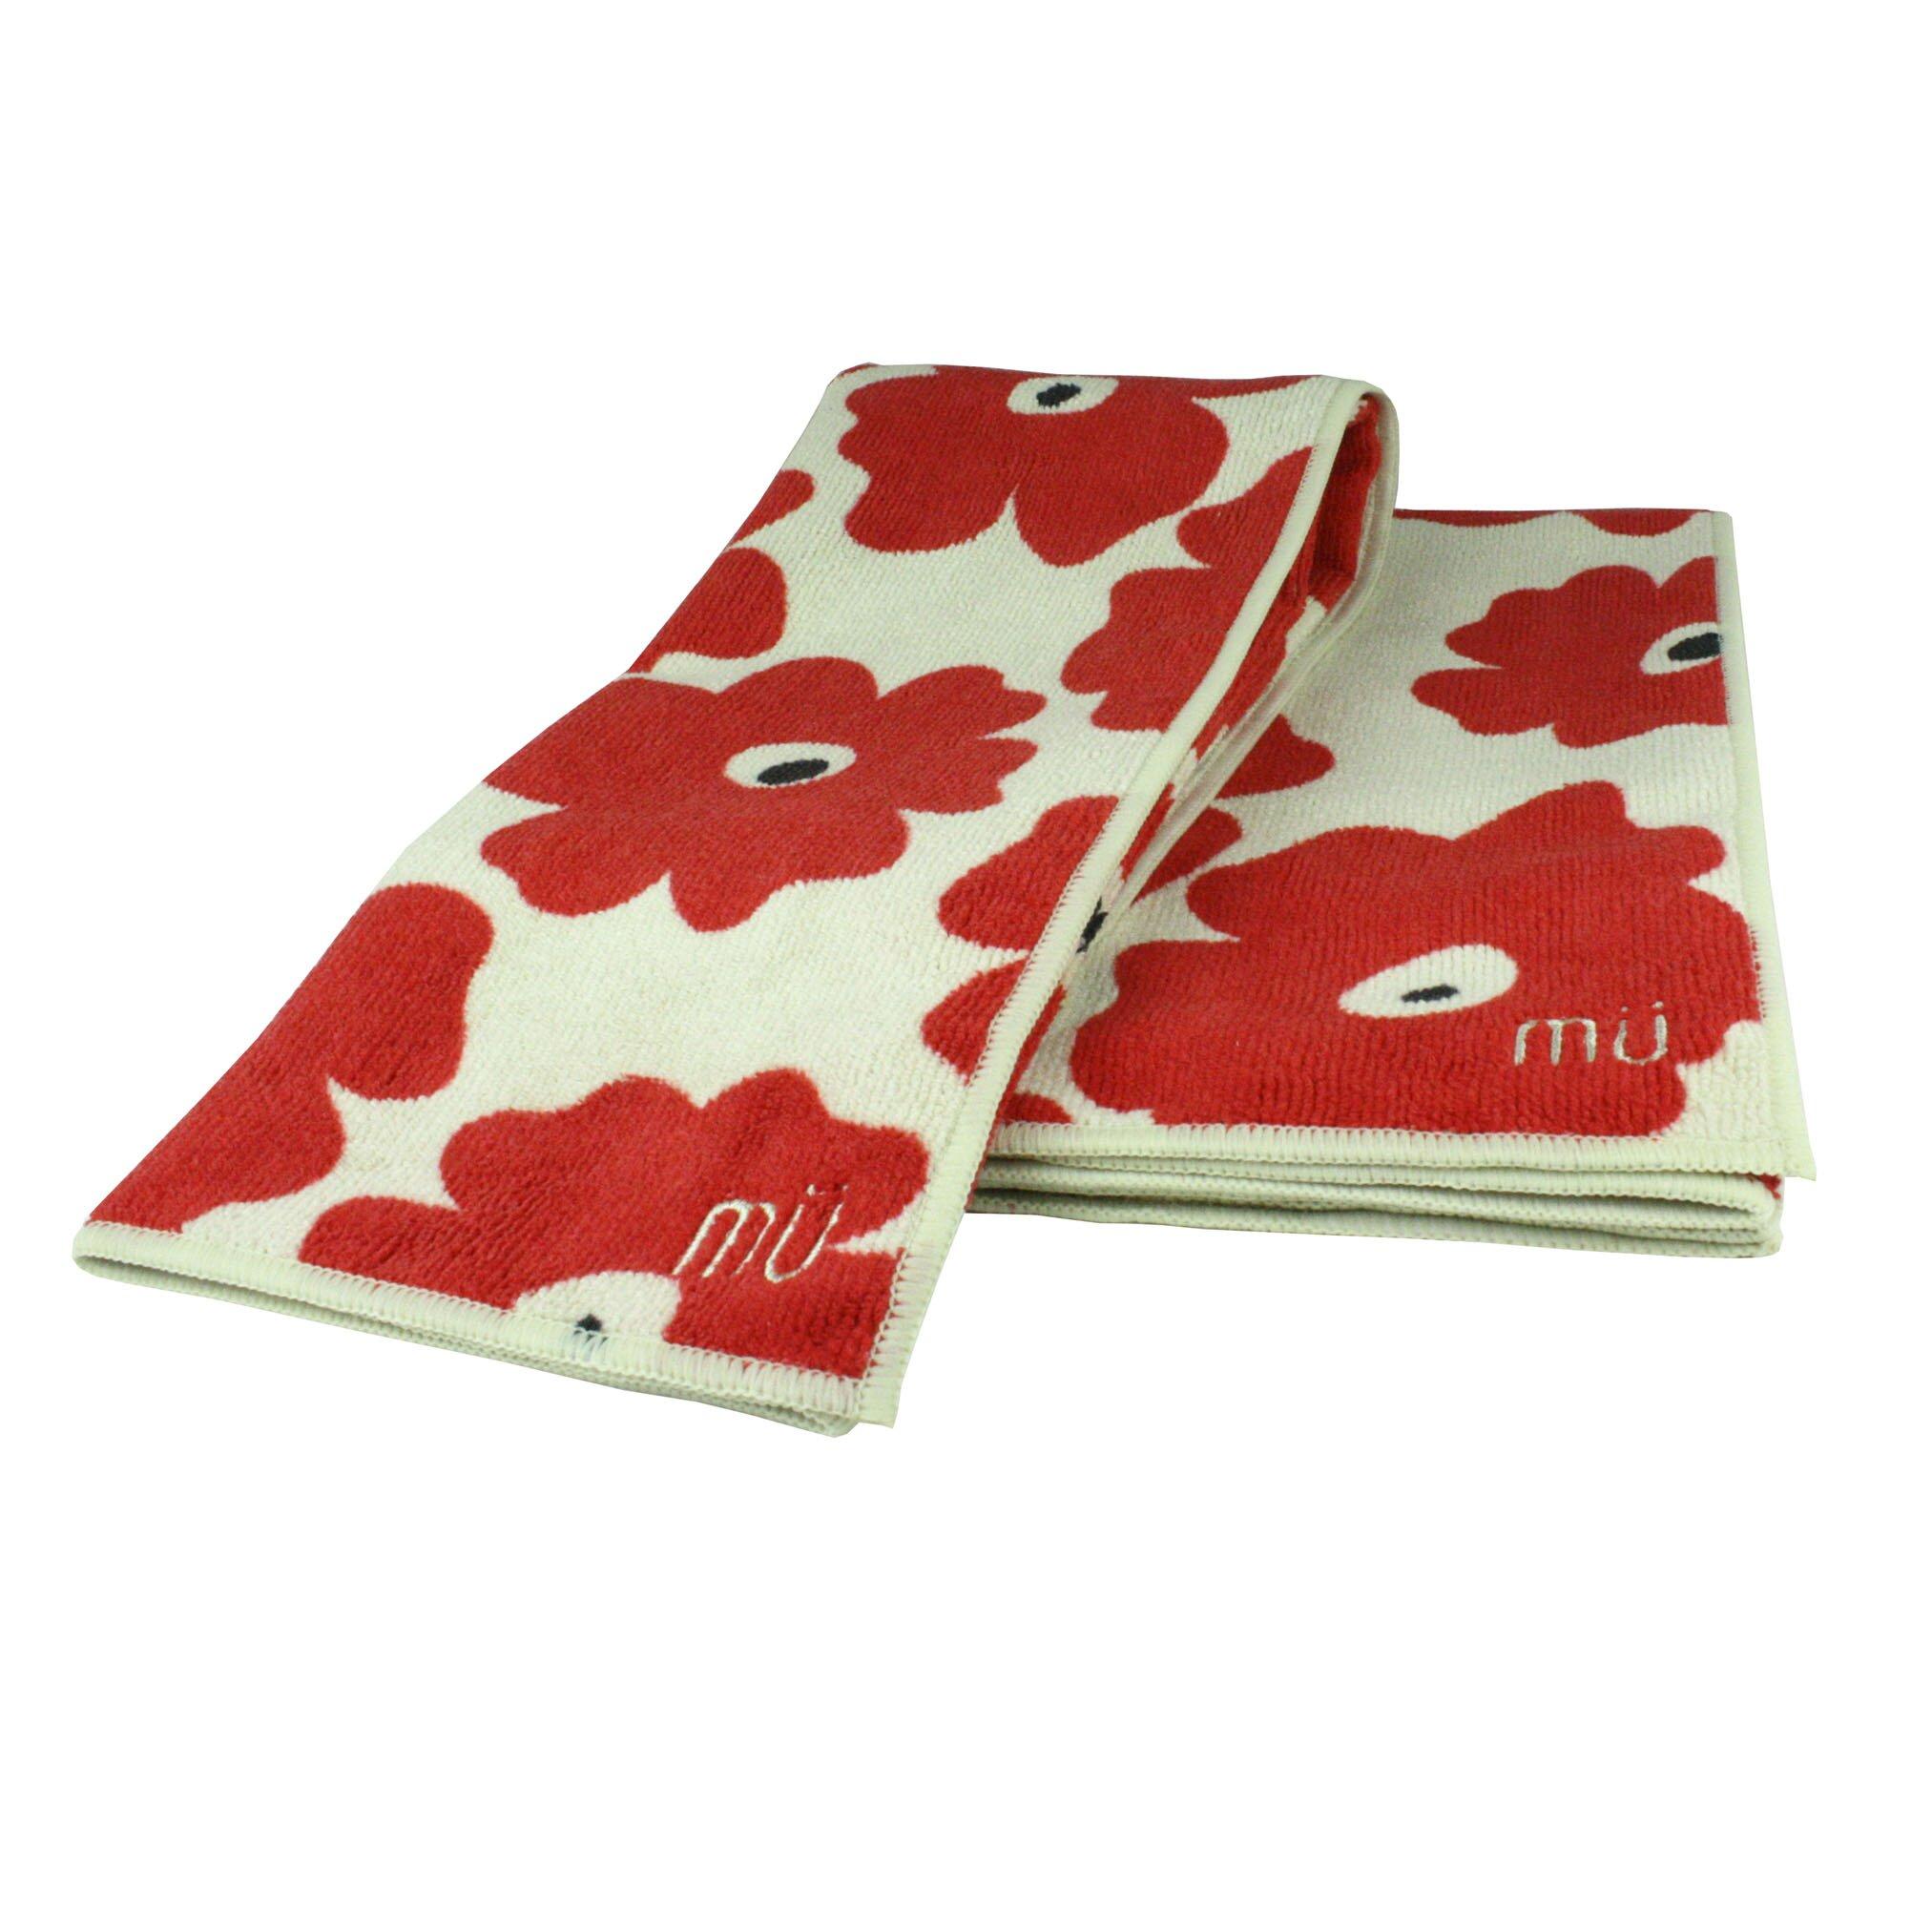 Red Kitchen Towels: MU Kitchen Poppy 2 Piece Dishcloth And Towel Set